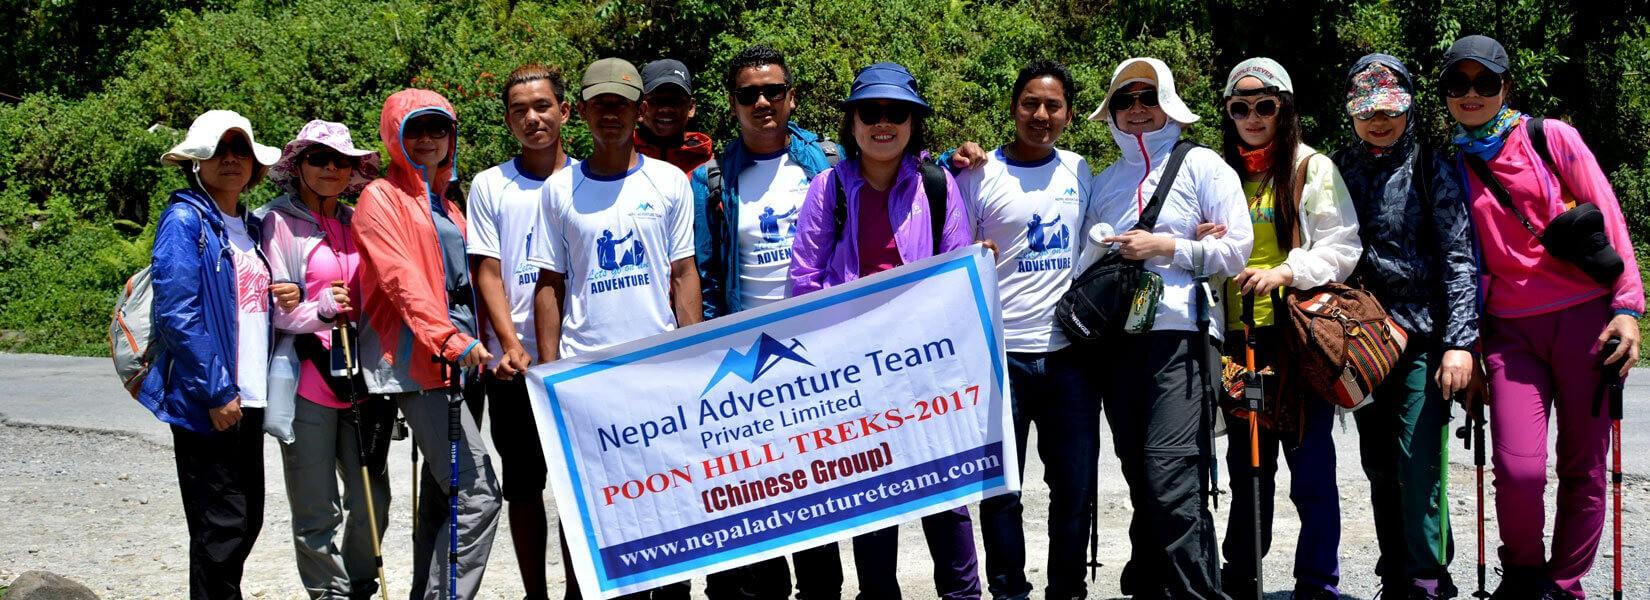 Annapurna Community Trek Nepal